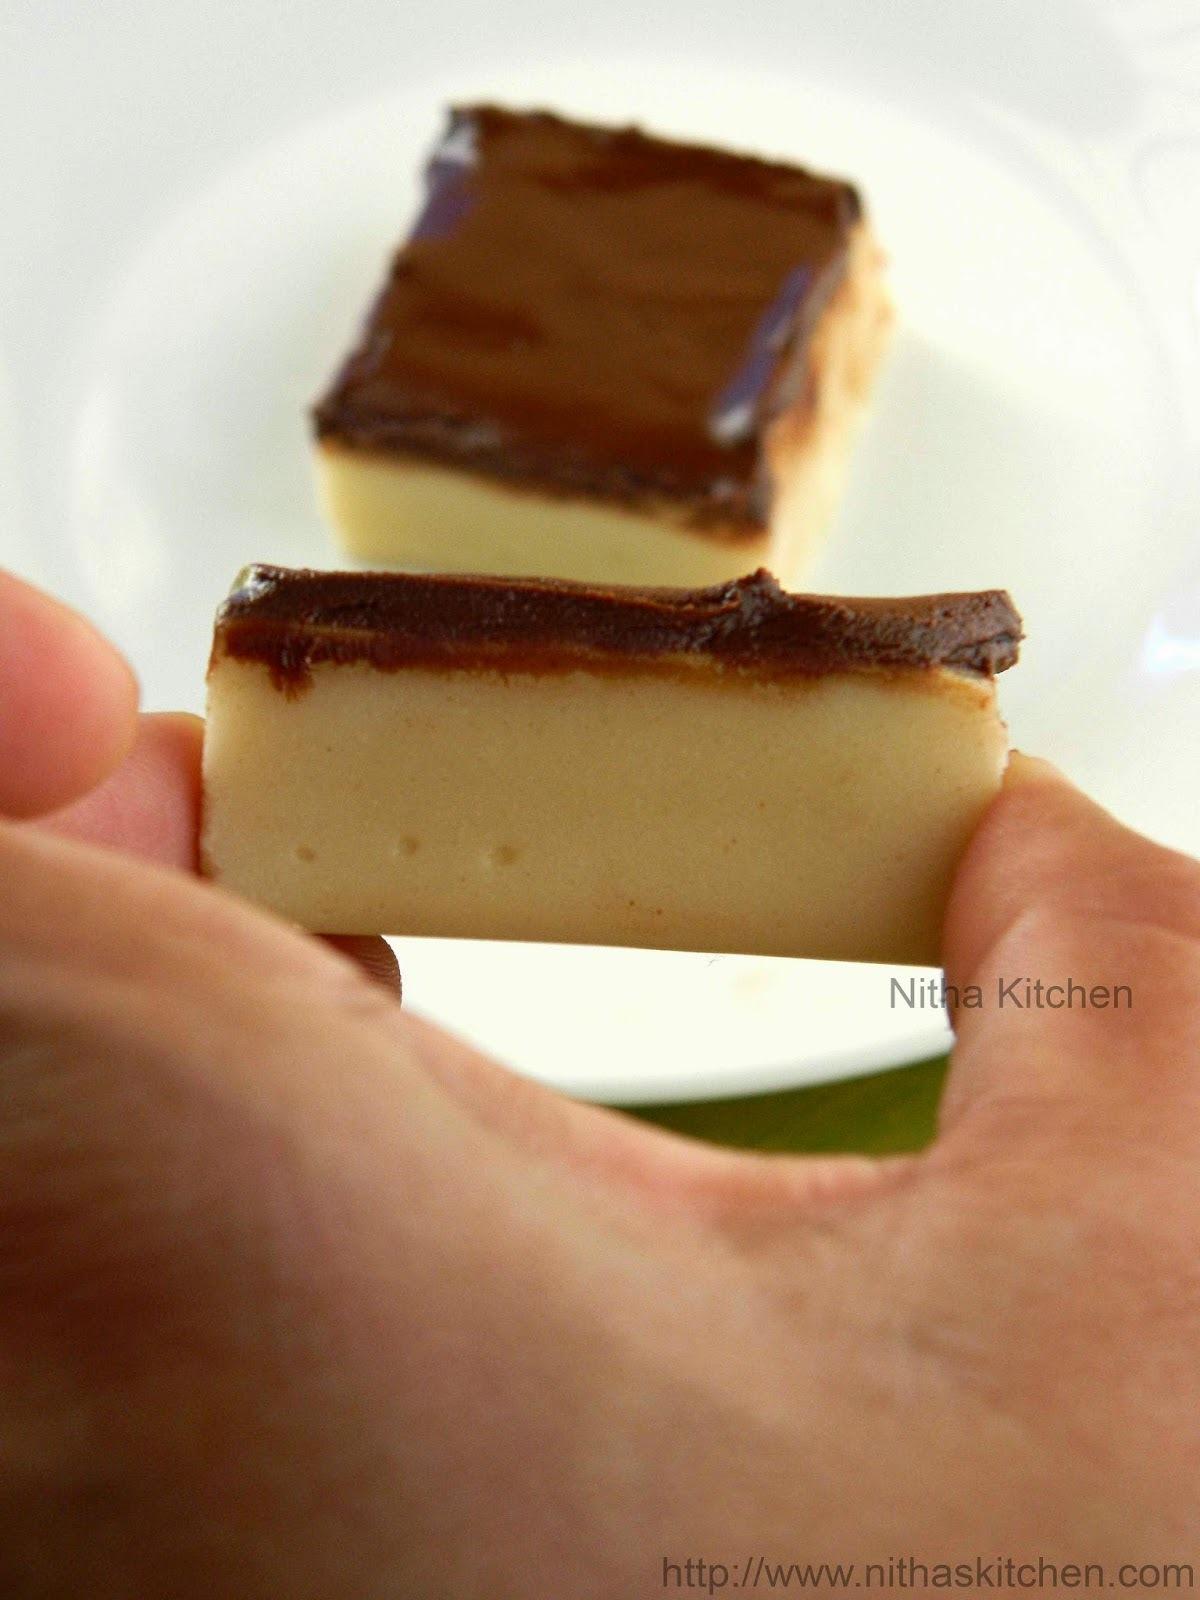 Maida Burfi with Chocolate Glaze | Chocolate Topped Maida Burfi Recipe